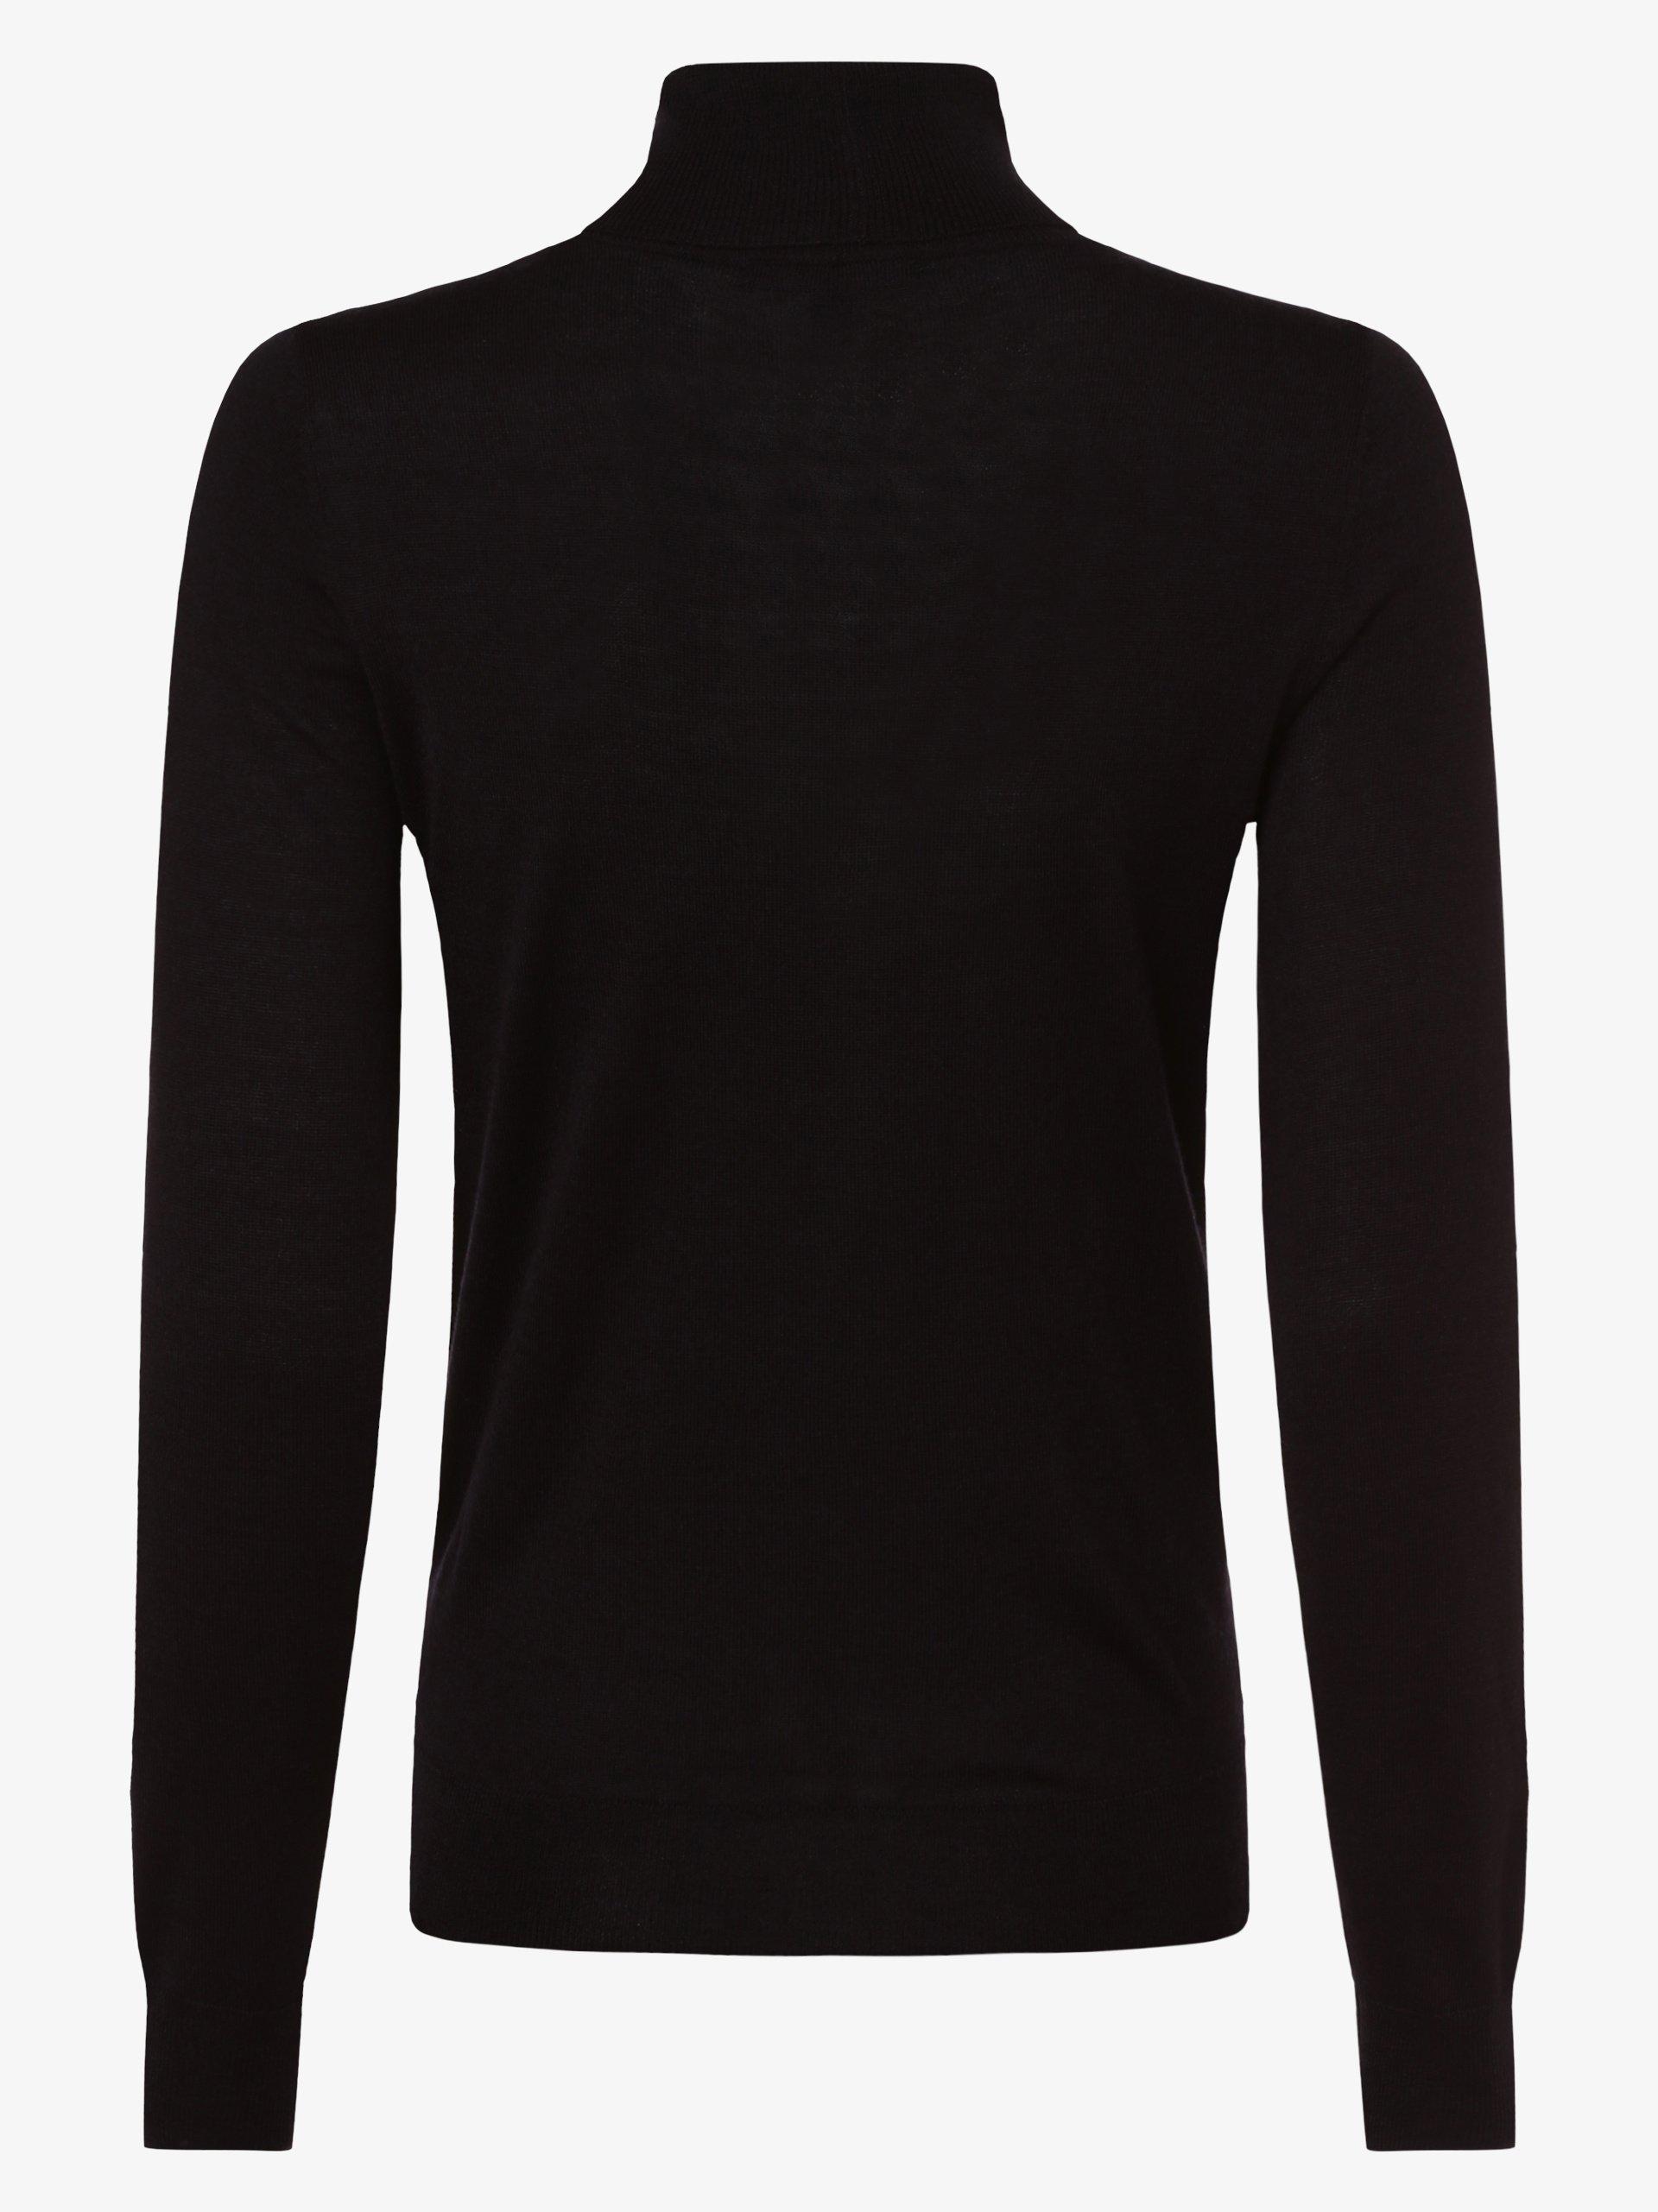 Armani Exchange Damen Pullover